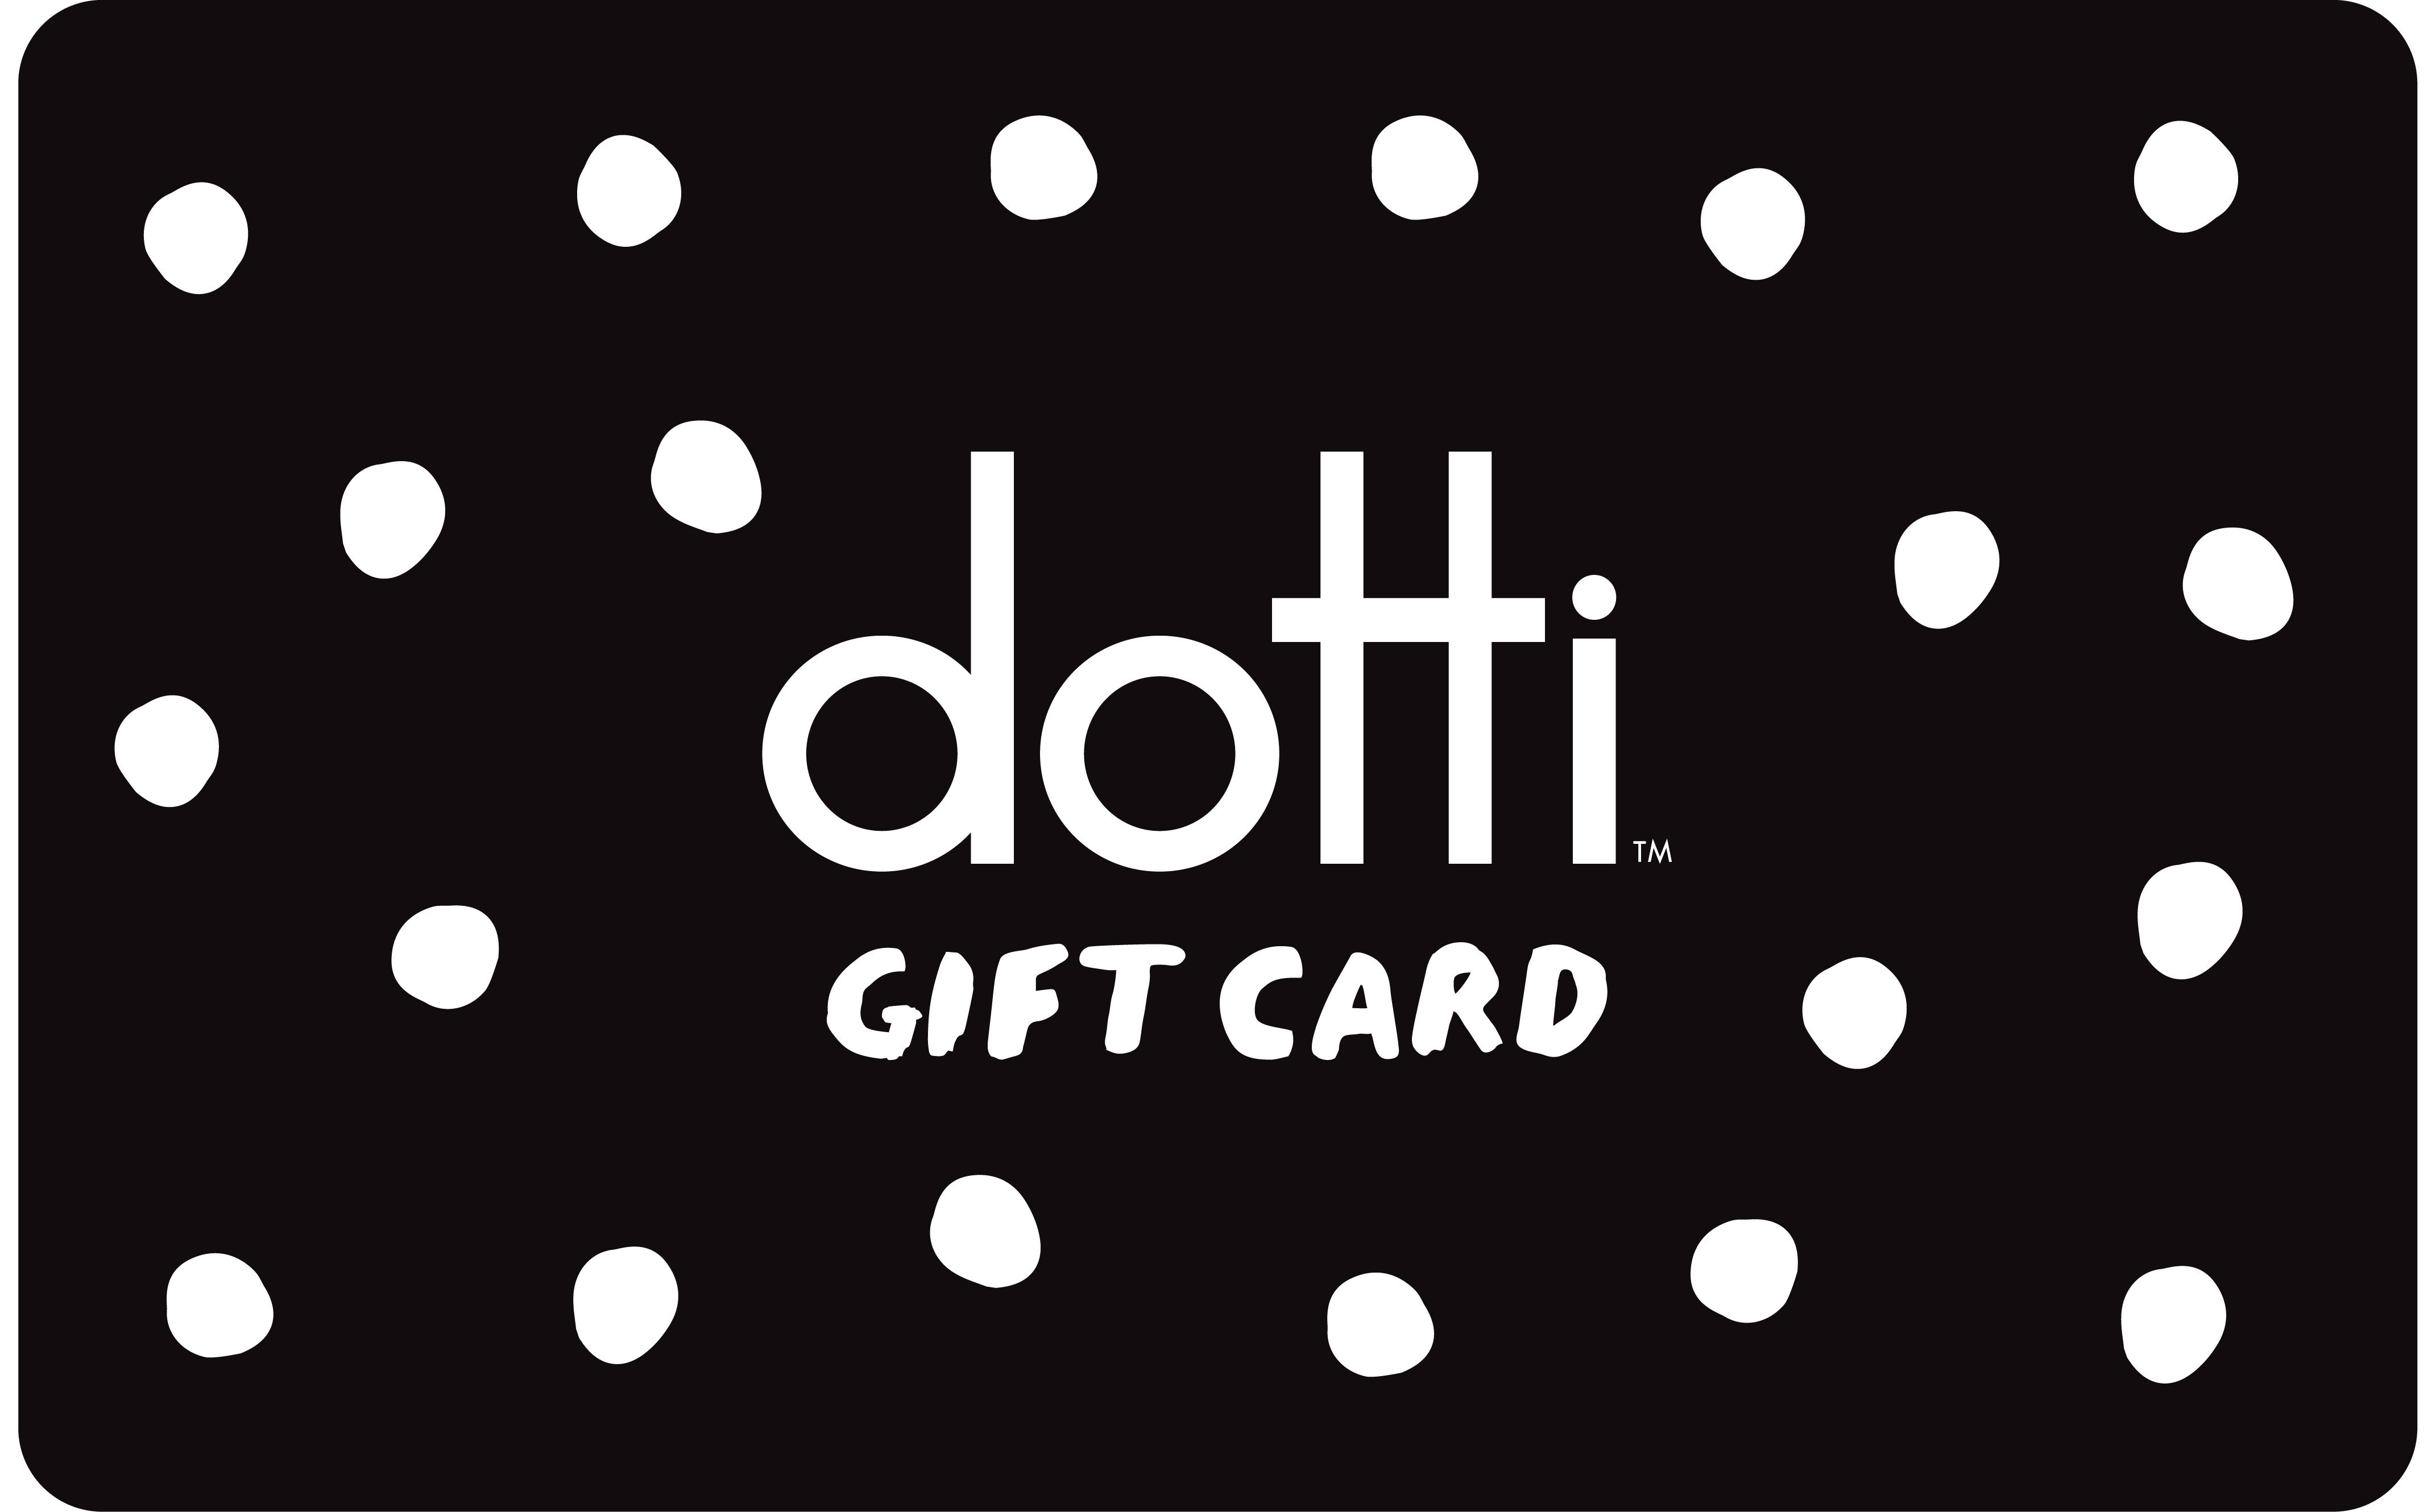 Gift Card Dots